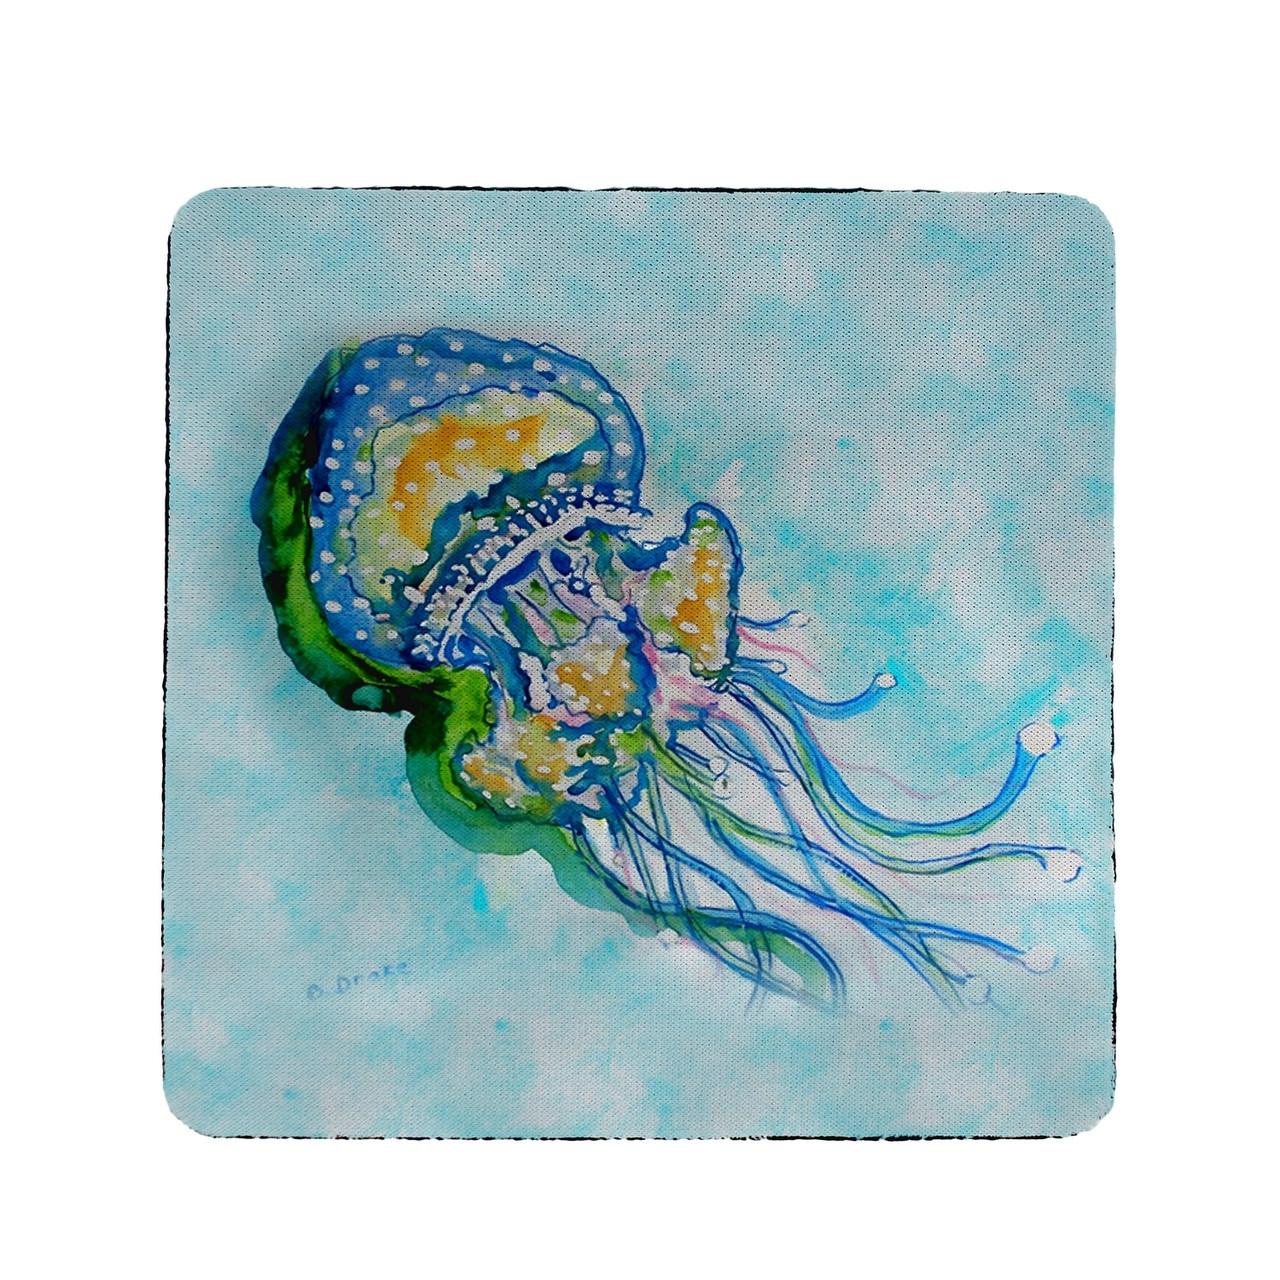 Jellyfish Coasters - Set of 4